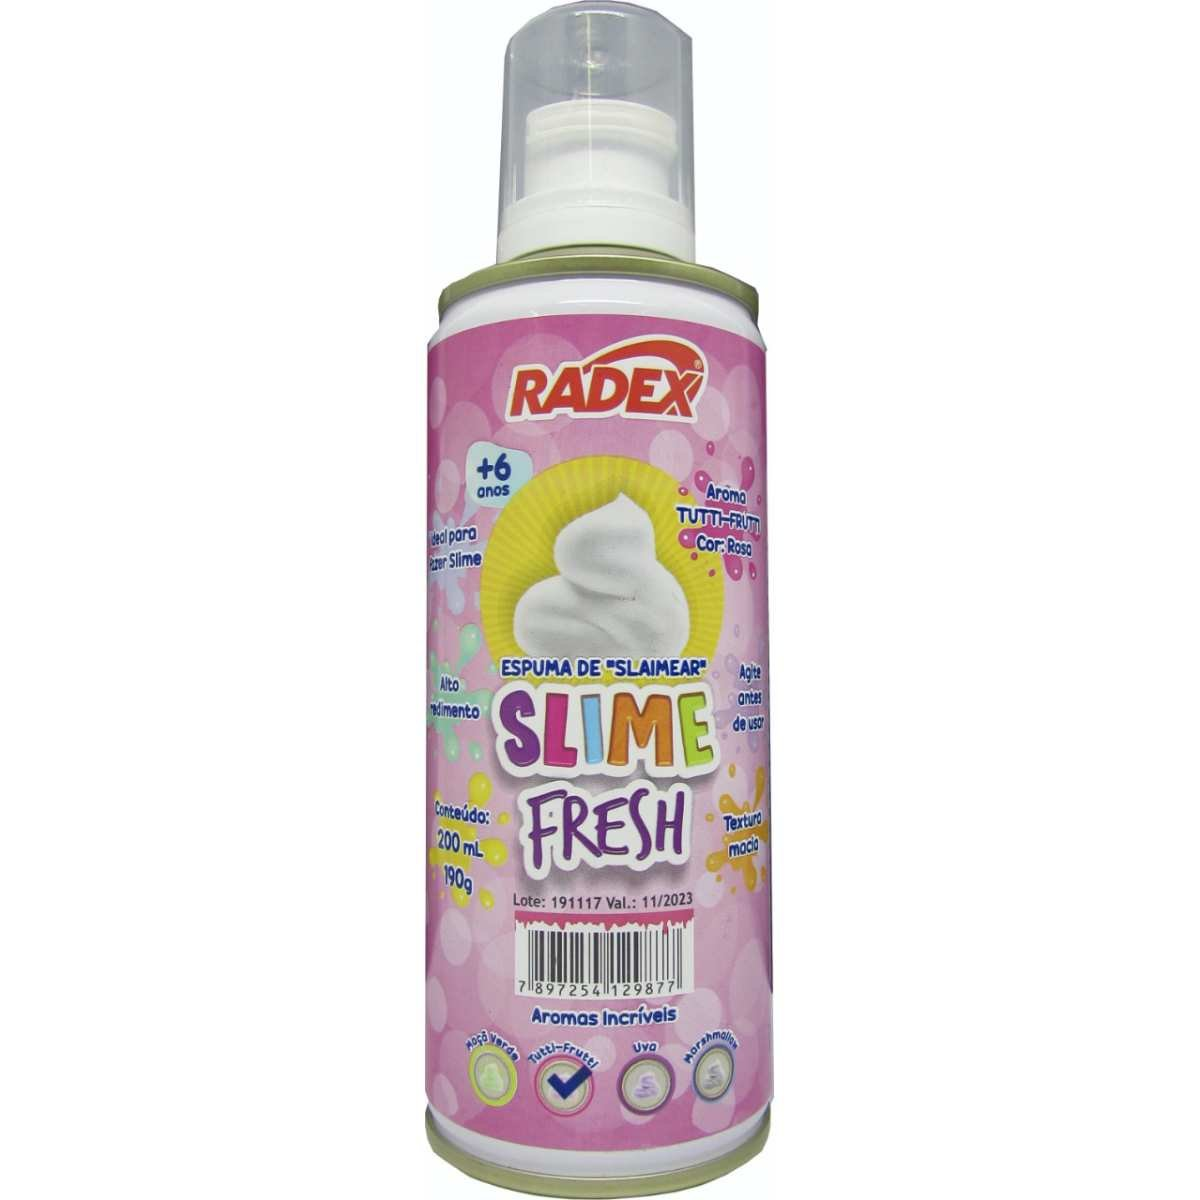 Espuma Slime Fresh 200 Ml Tuti Frutti 8067 Radex